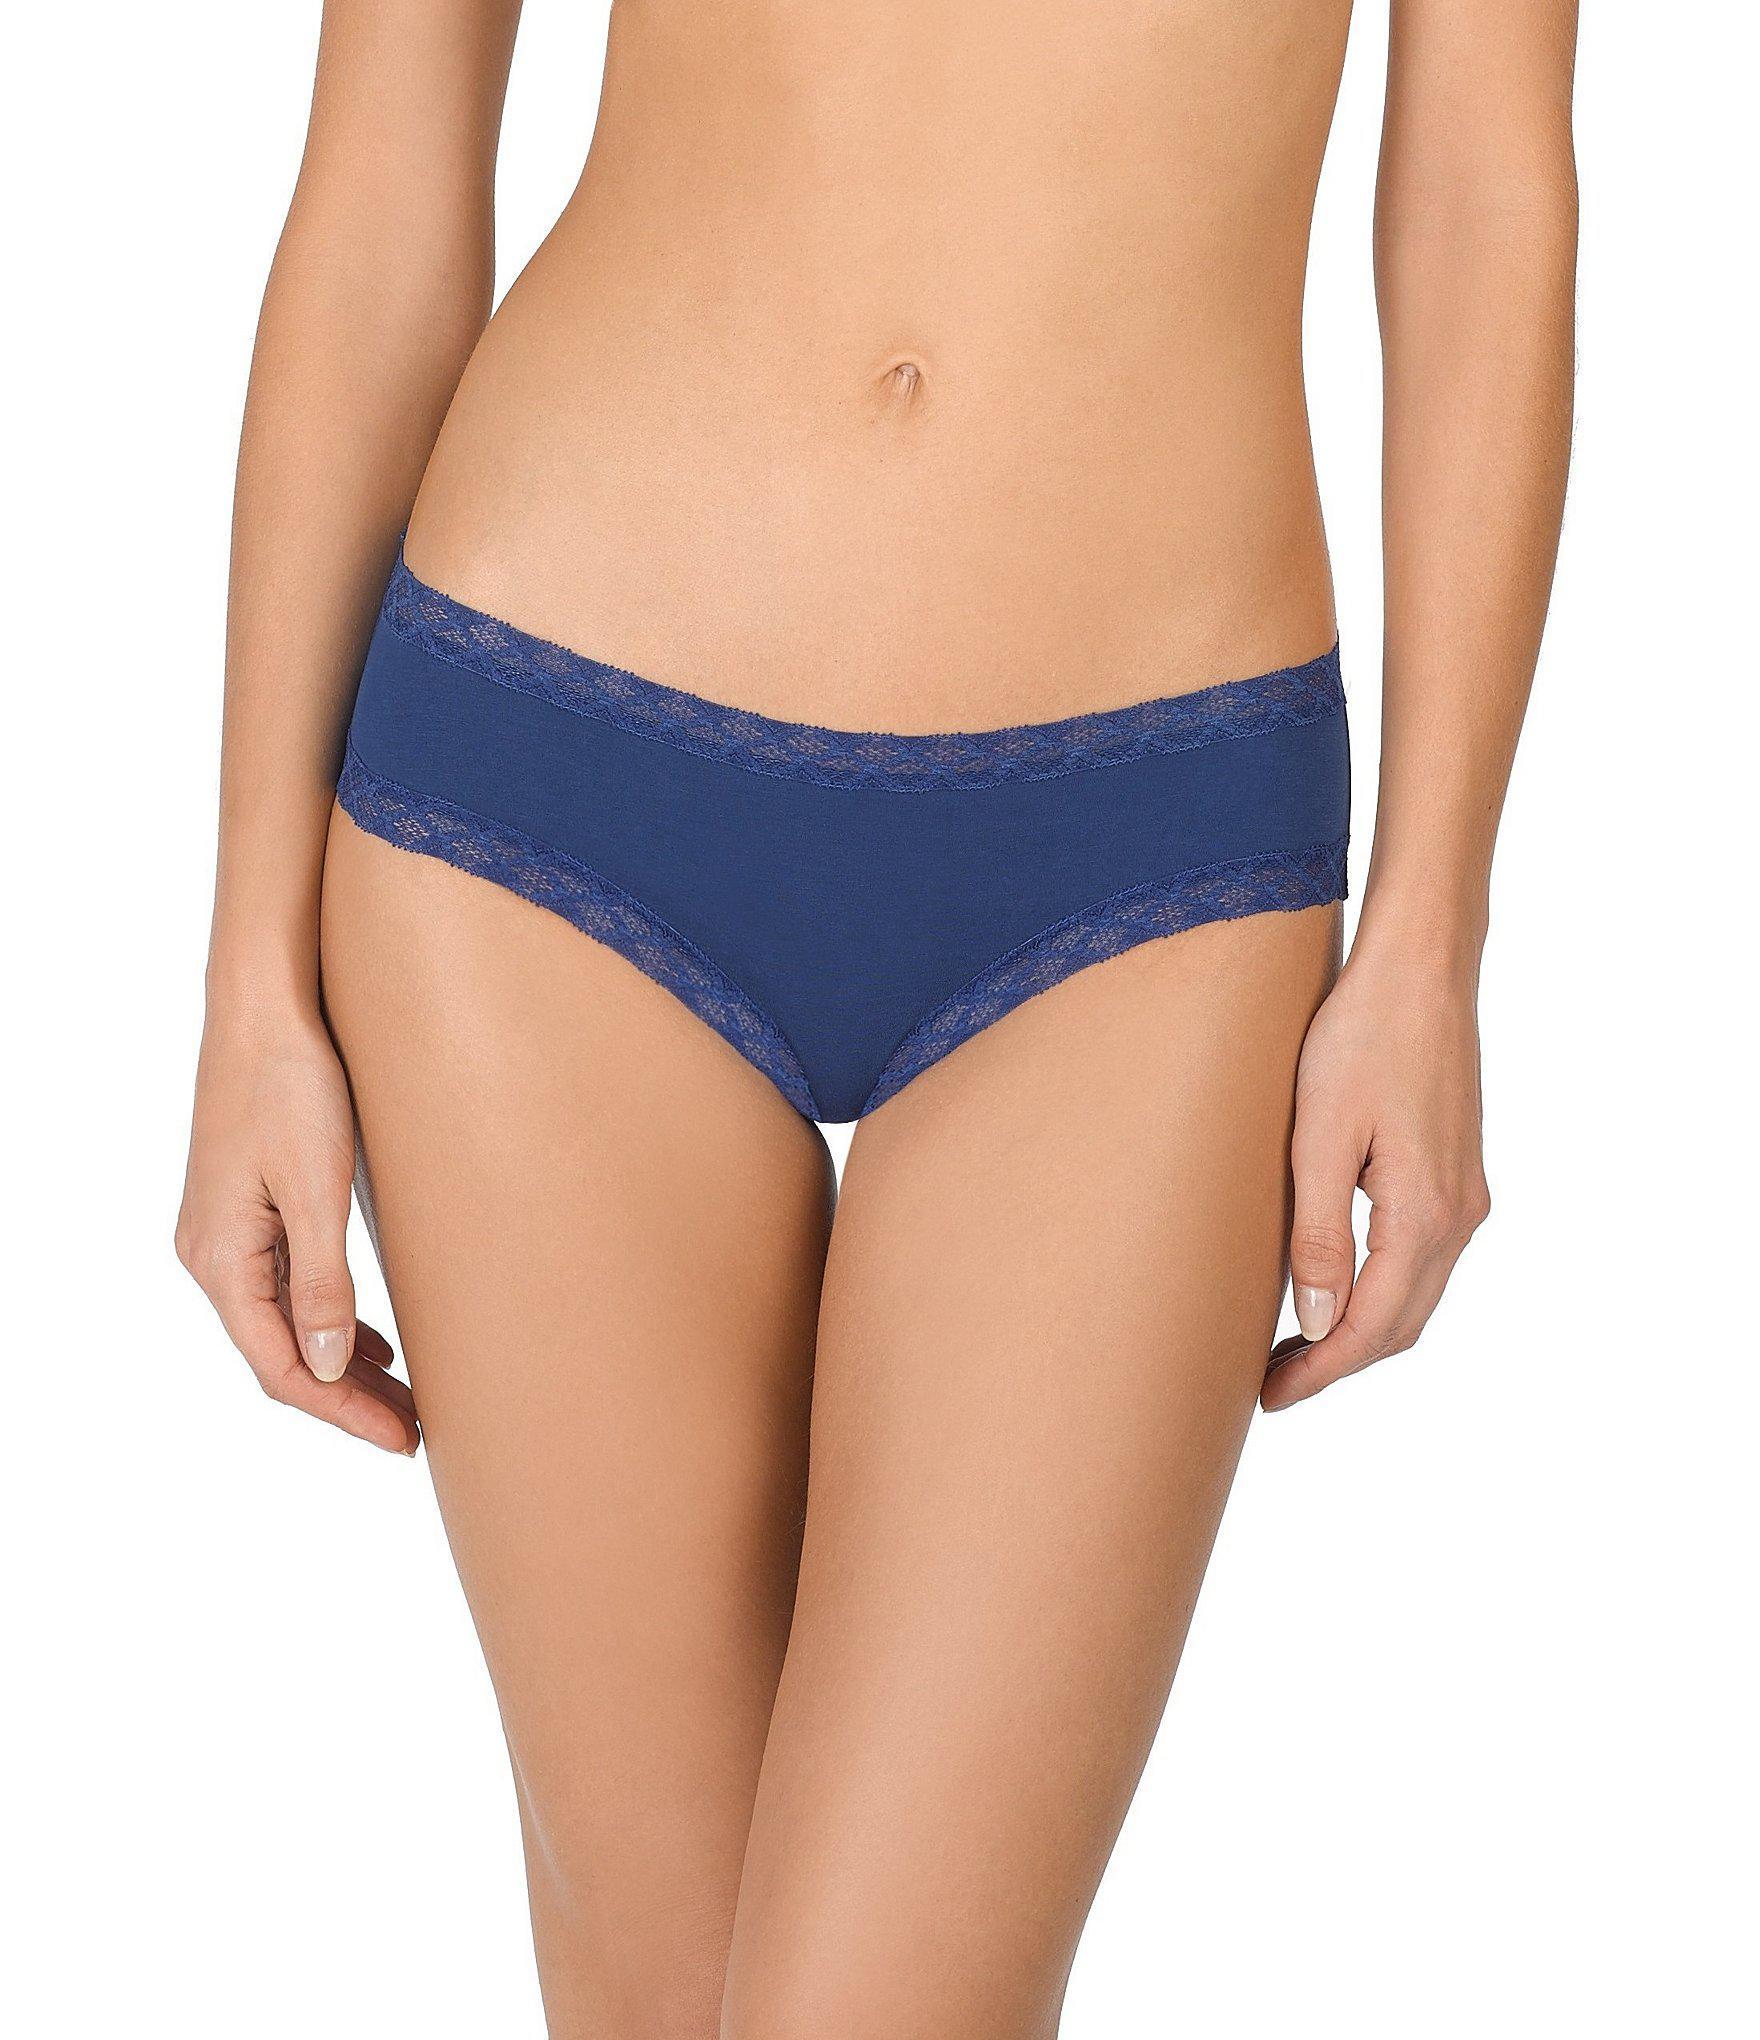 a0dbca7ad3dd Lyst - Natori Bliss Pima Cotton Girl Brief Panty in Blue